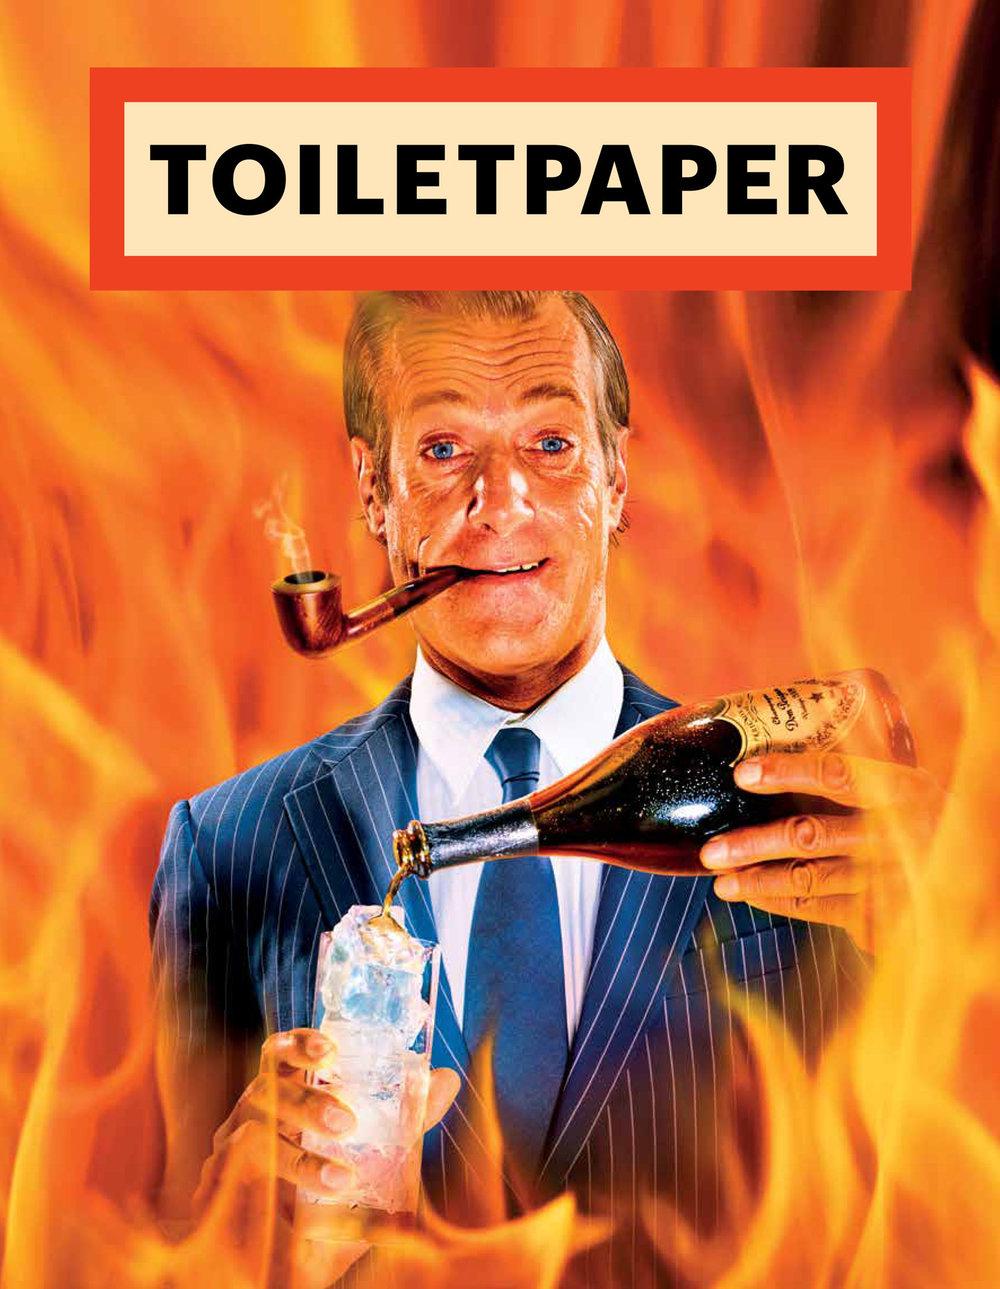 toiletpaper_dompe.jpg